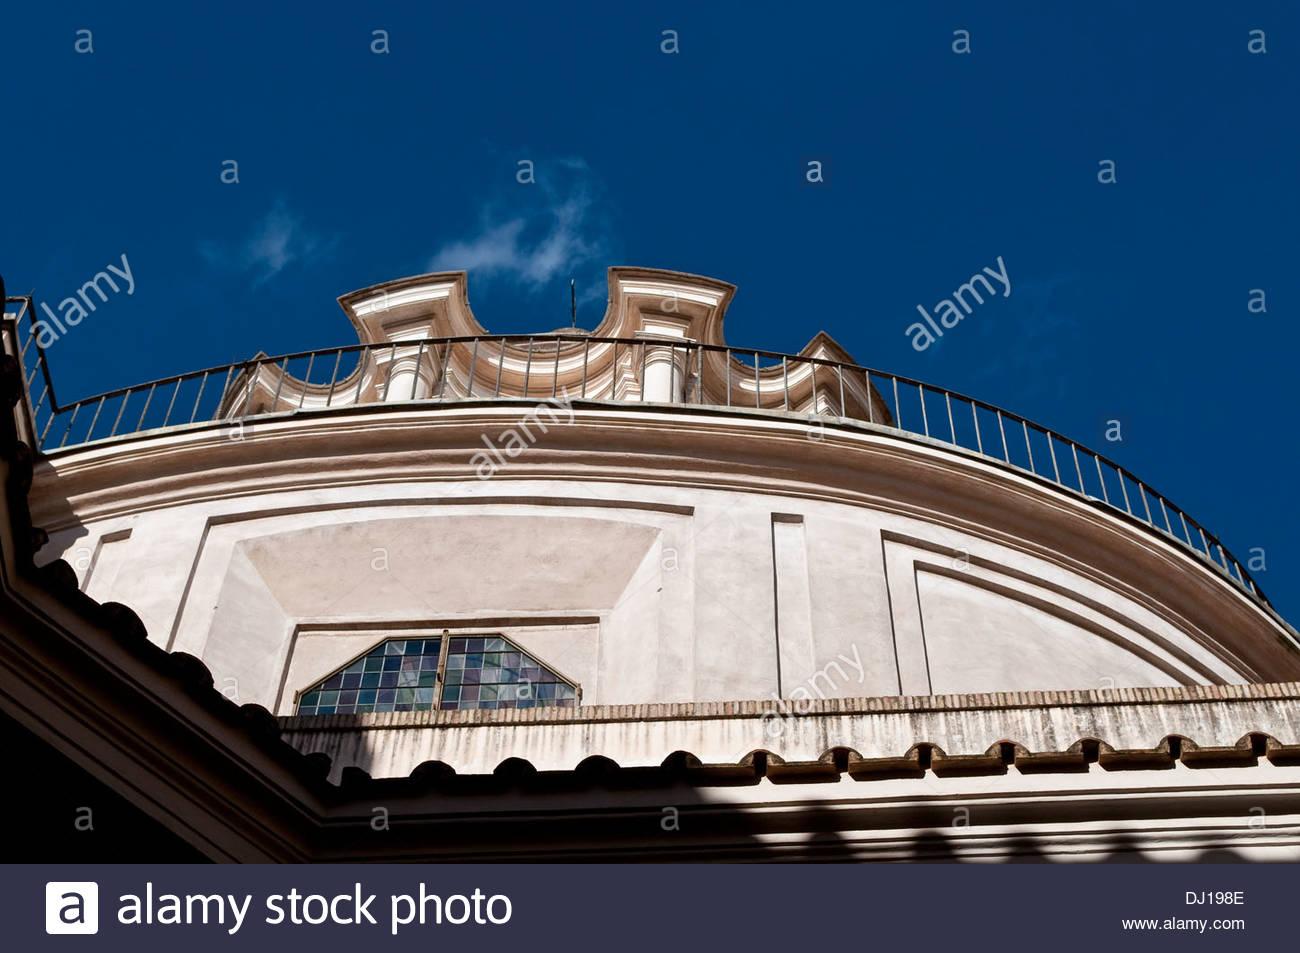 Church of Saint Charles at the Four Fountains -San Carlino alle quattro fontane in Via del Quirinale, Rome, Italy - Stock Image